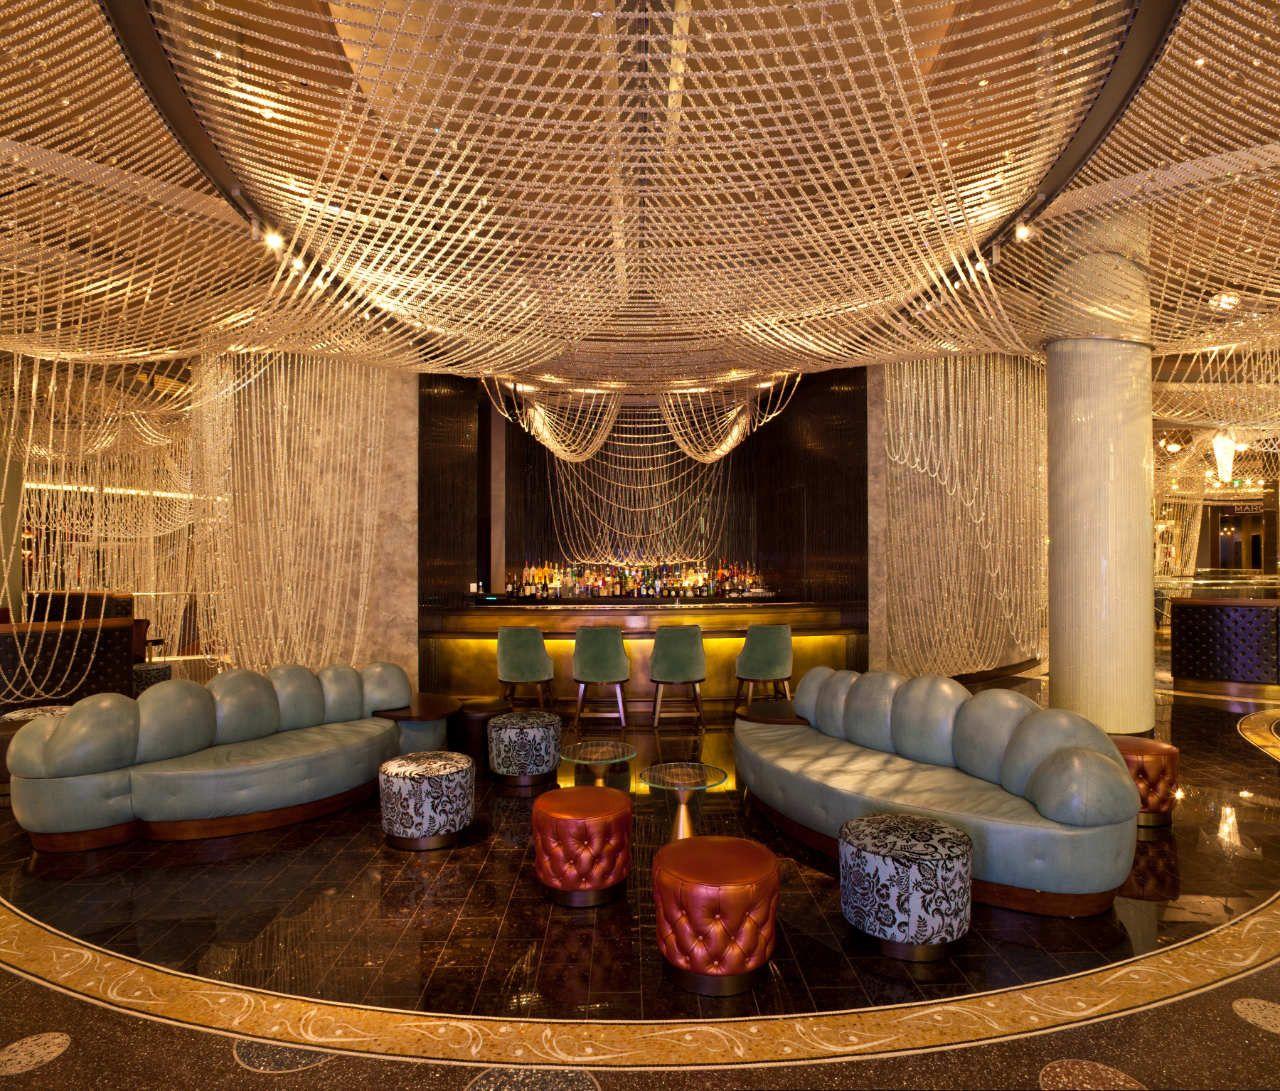 Gallery Of The Cosmopolitan Of Las Vegas Interior Rockwell Group 4 Cosmopolitan Las Vegas Hotel Interior Hotel Chandelier